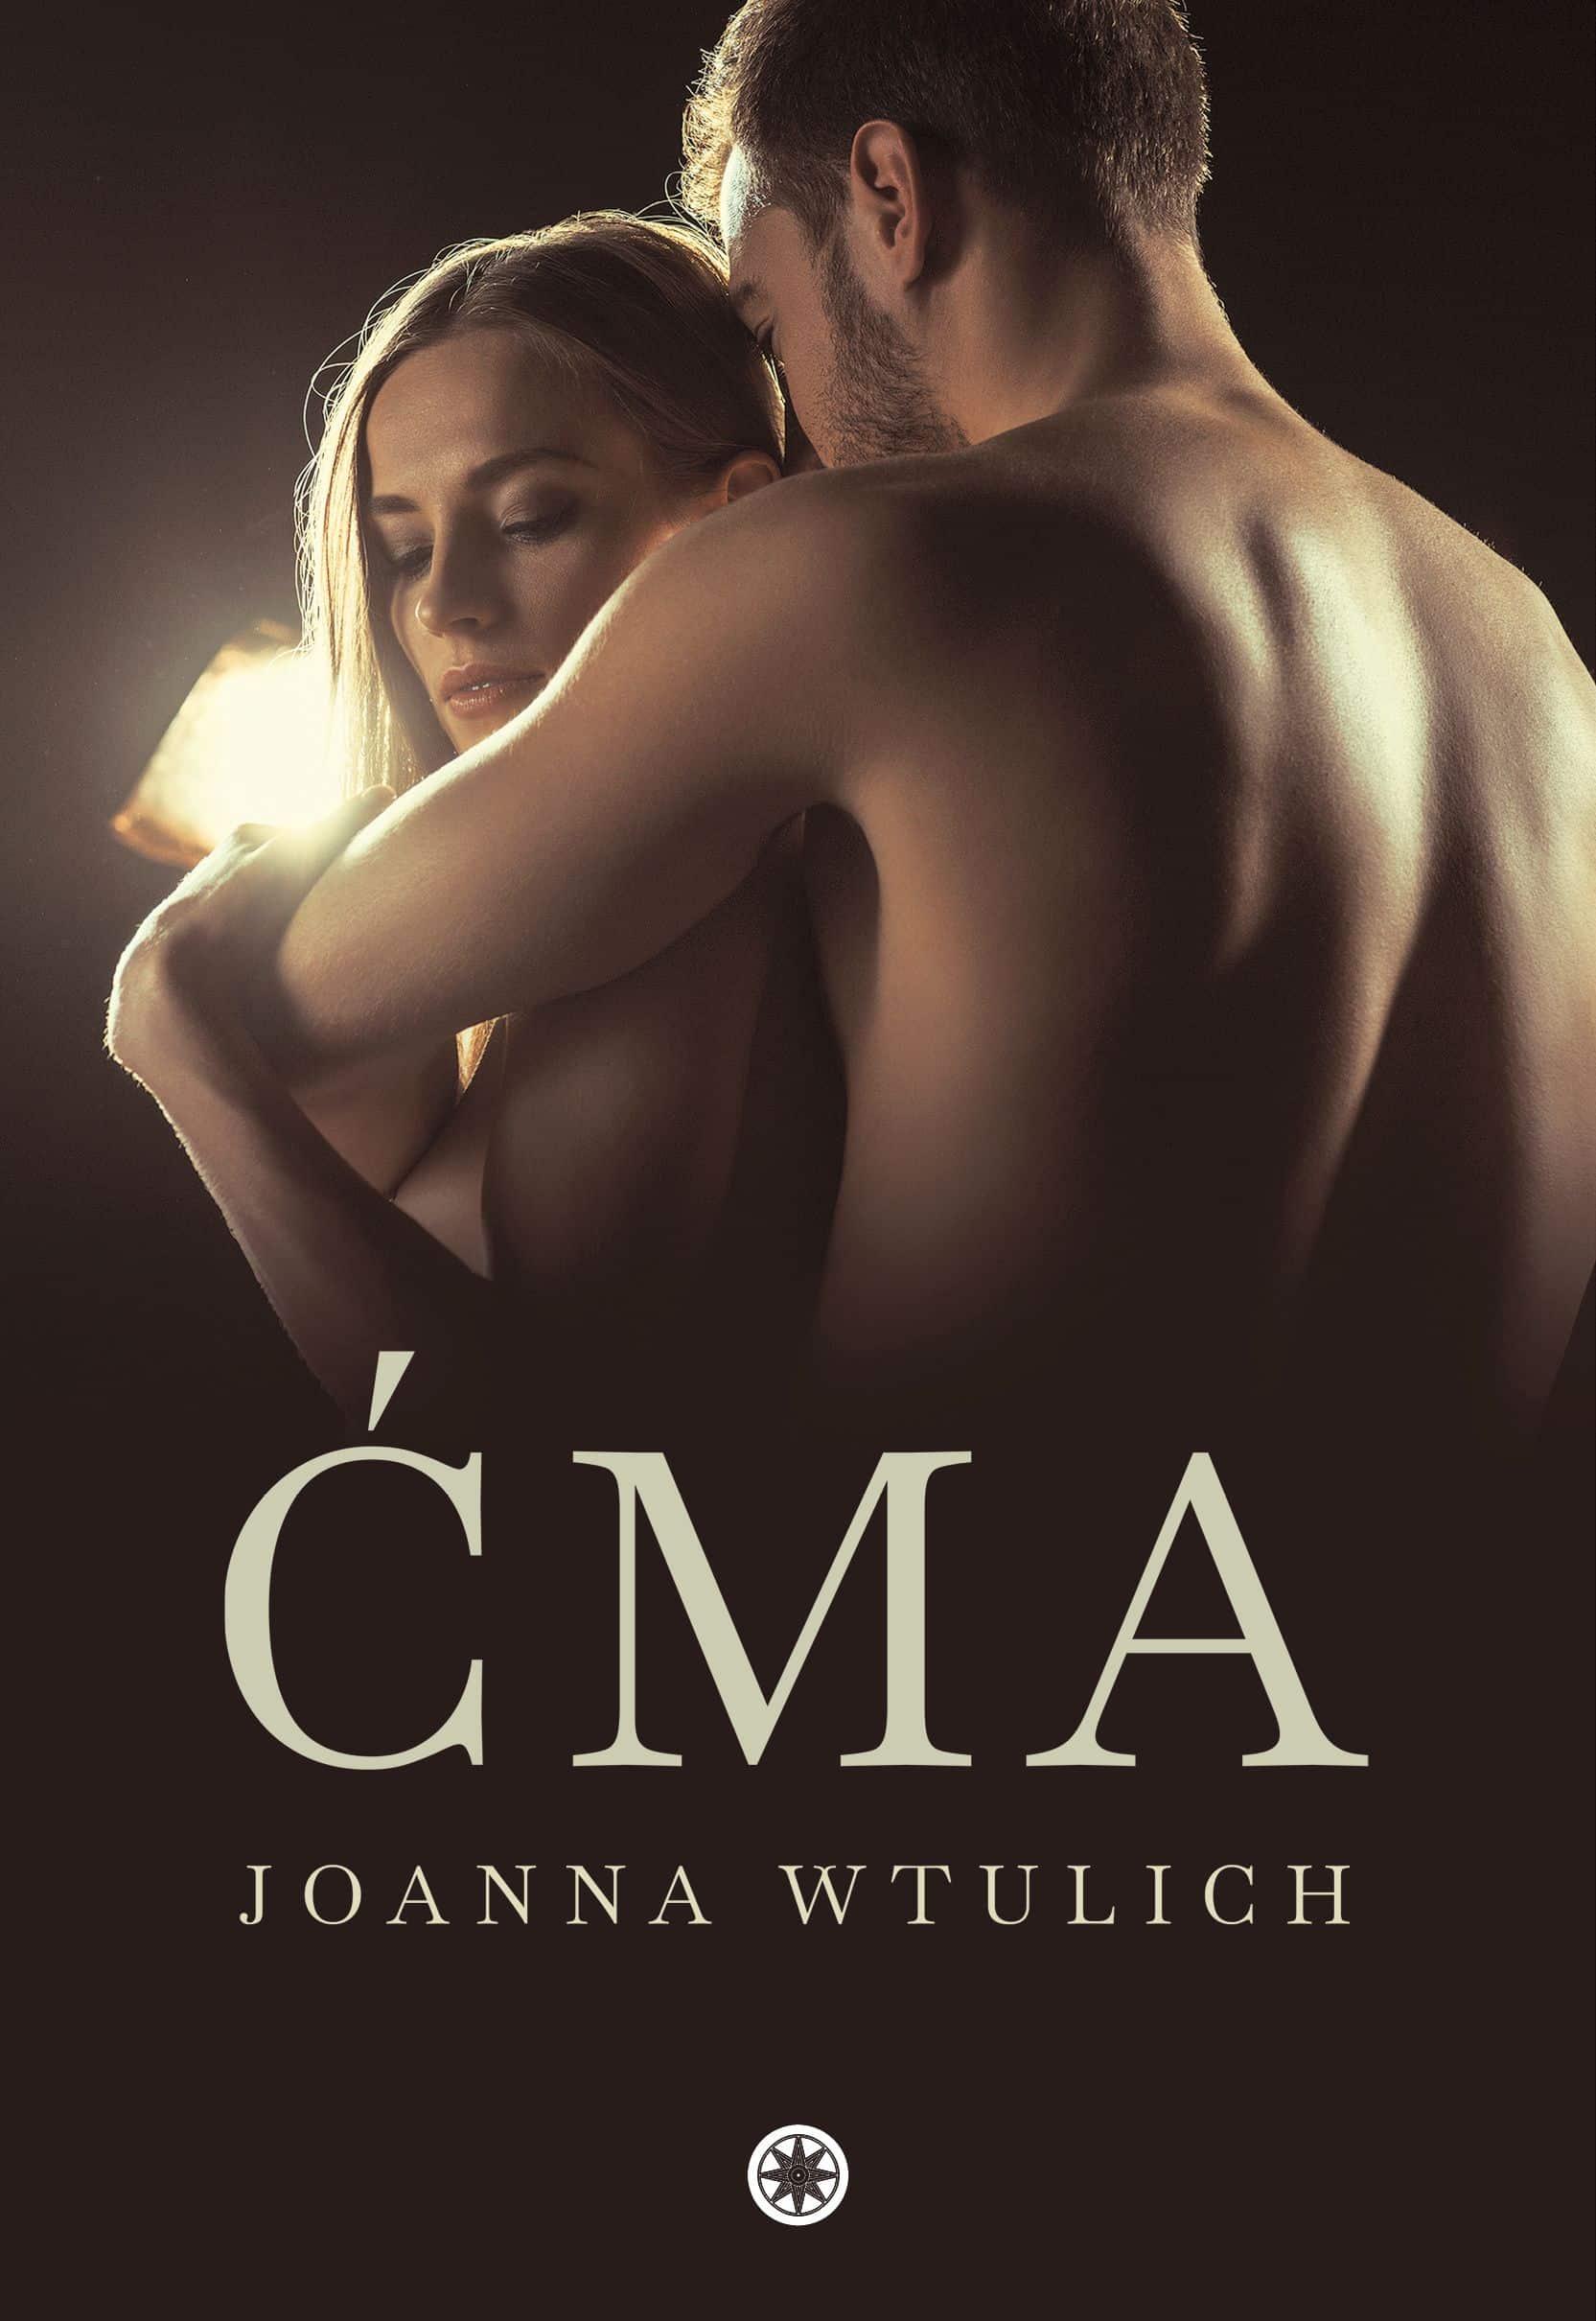 Ćma - Joanna Wtulich